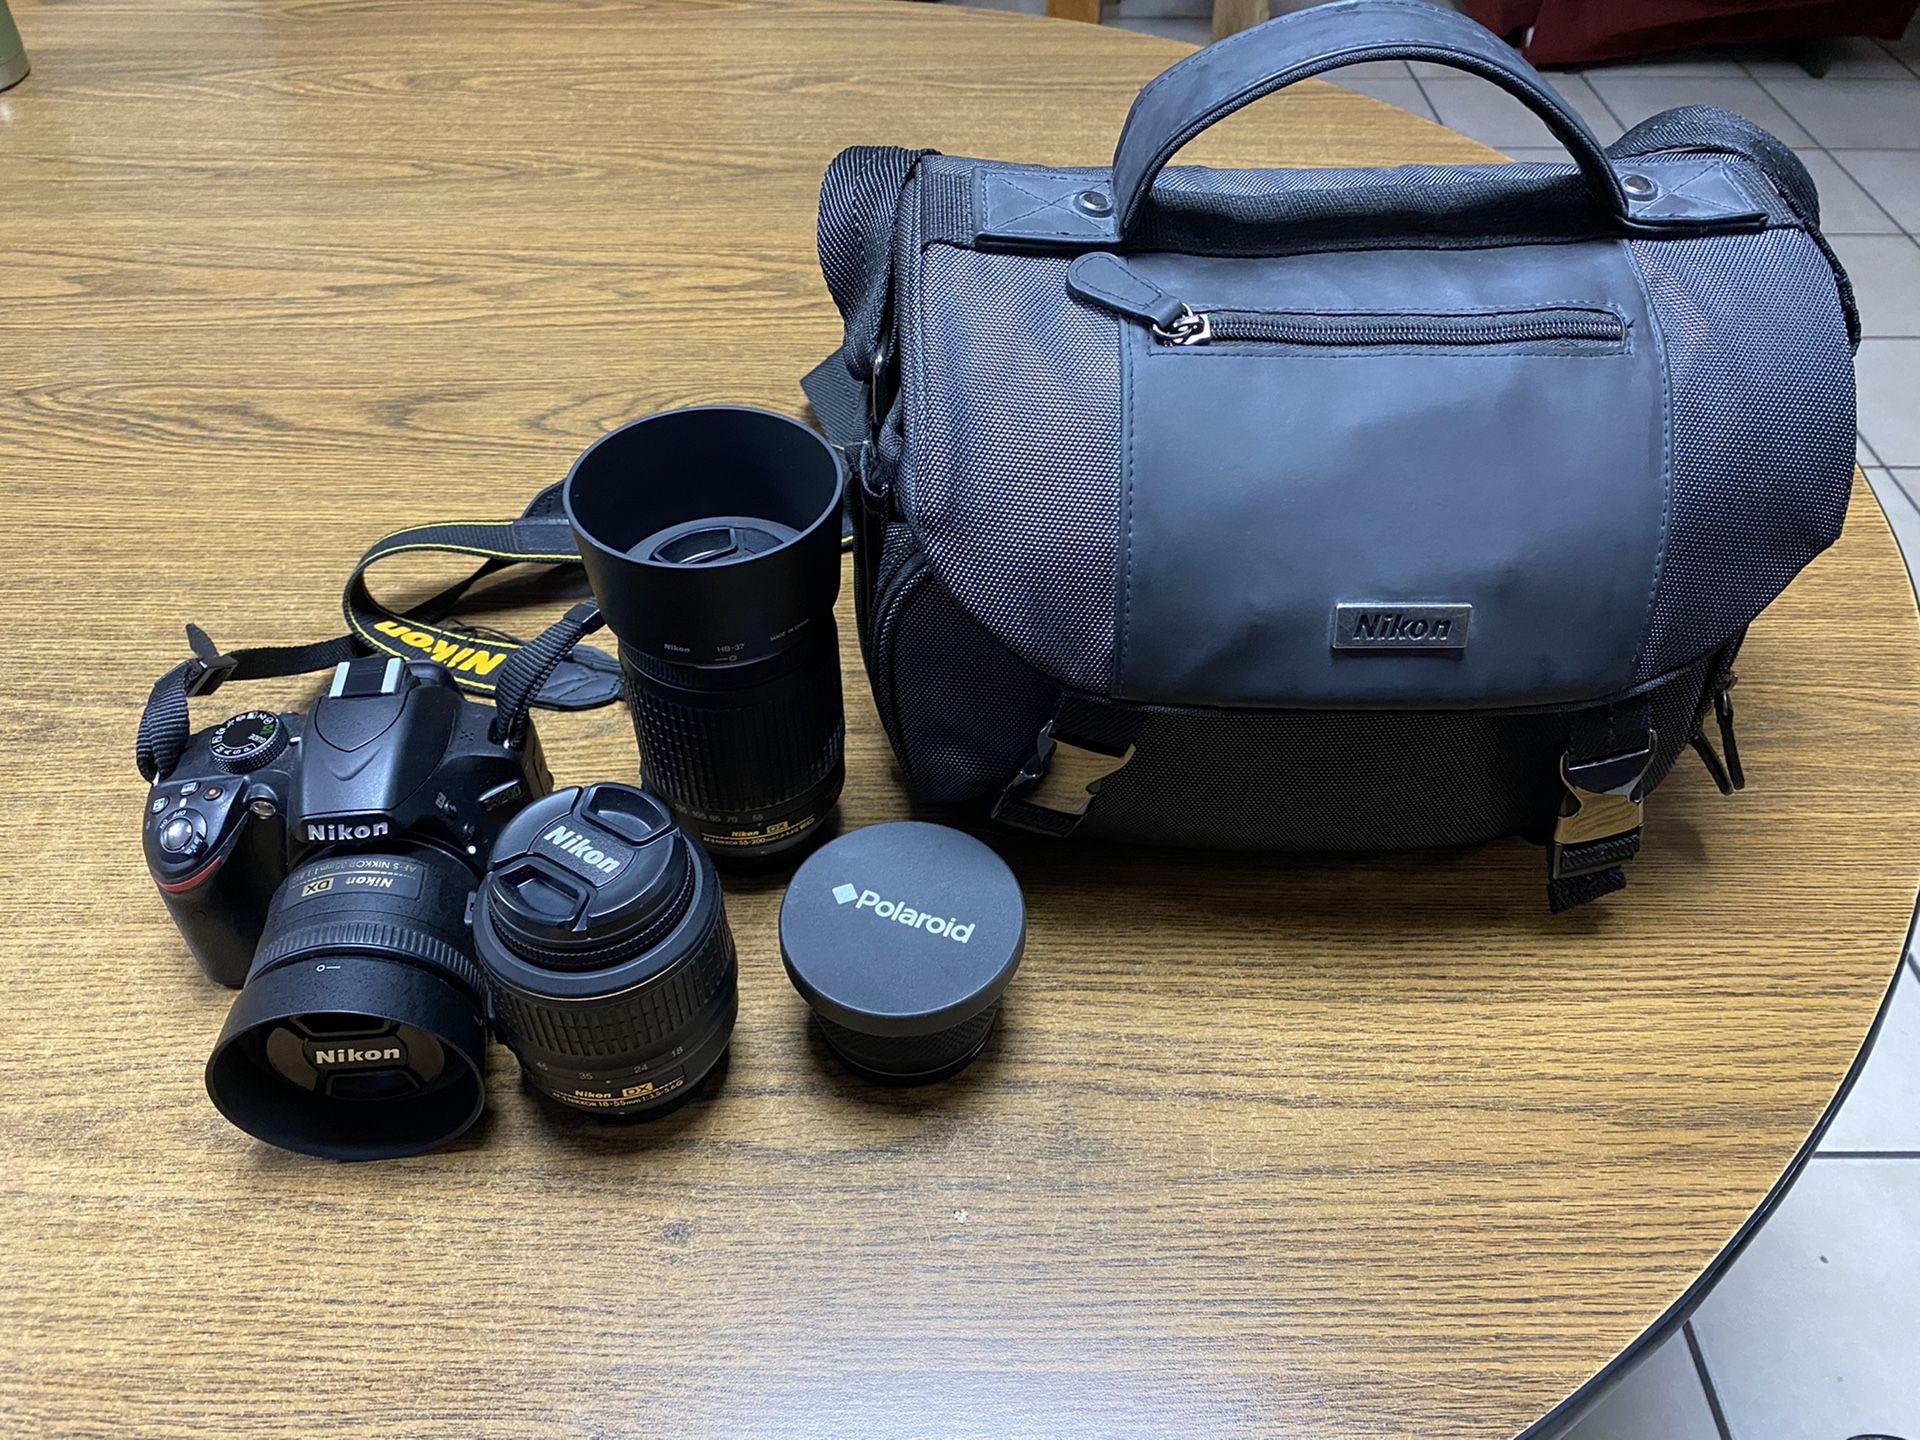 Nikon 3200 kit